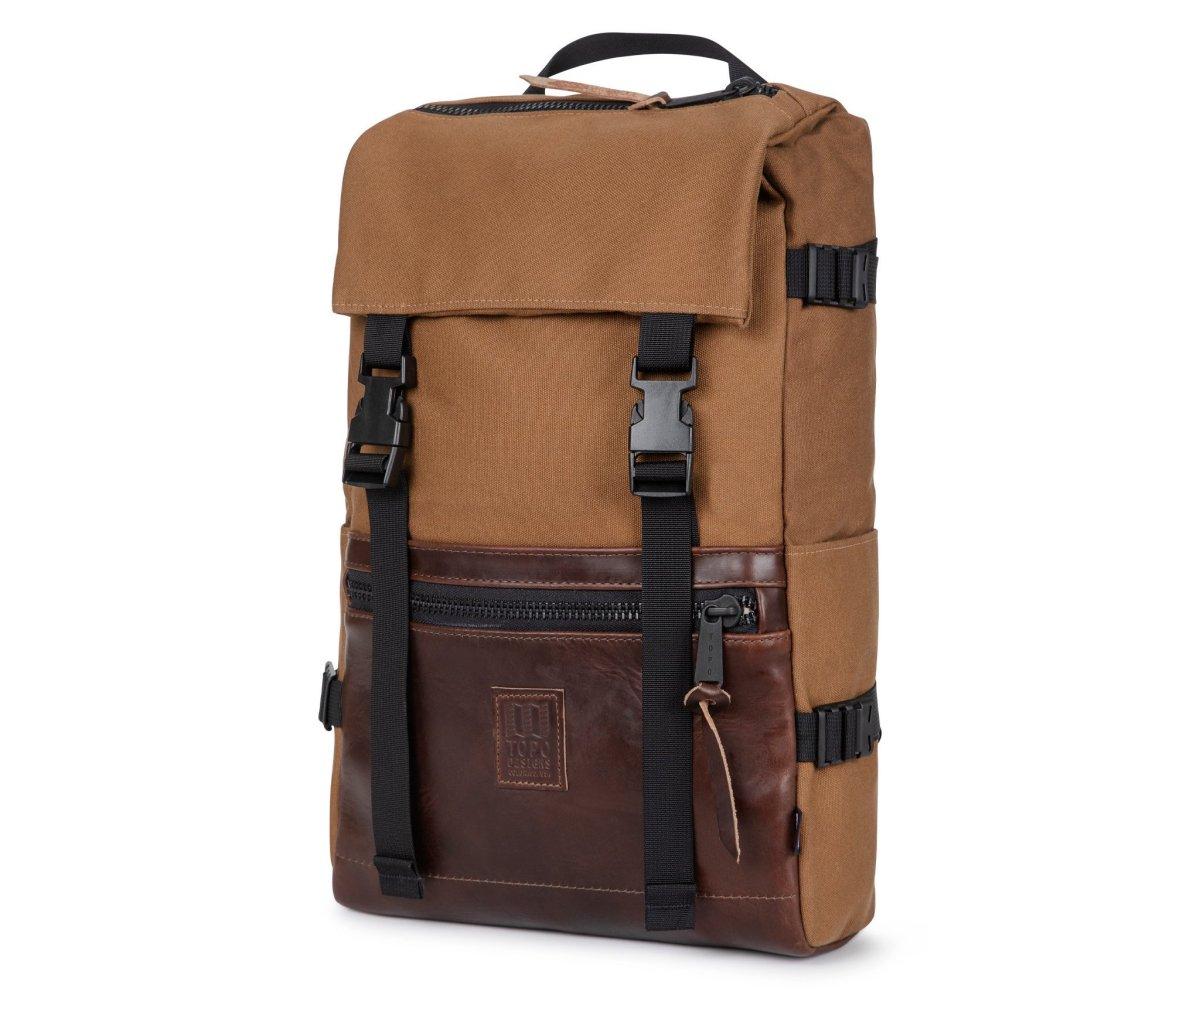 Topo Designs Heritage Bags